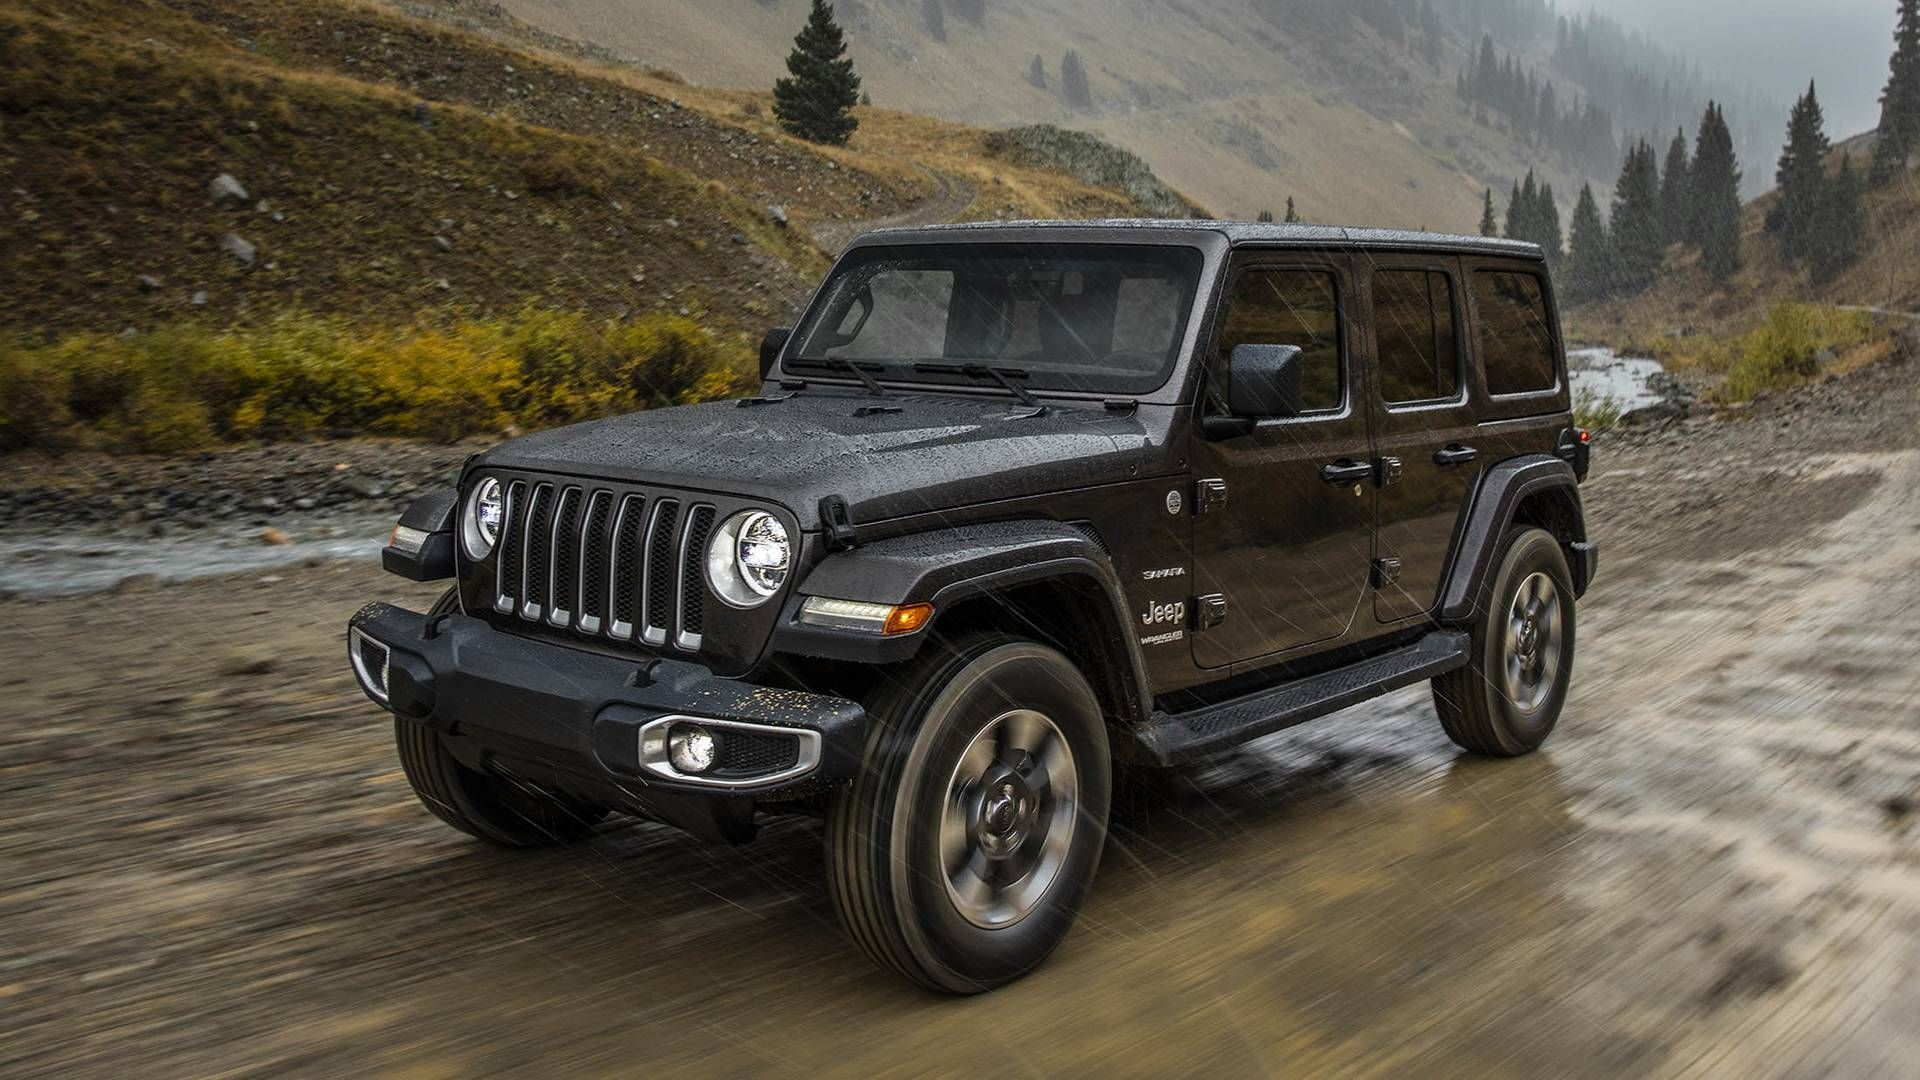 2018 Black Jeep Wrangler Jeep Wrangler Unlimited New Jeep